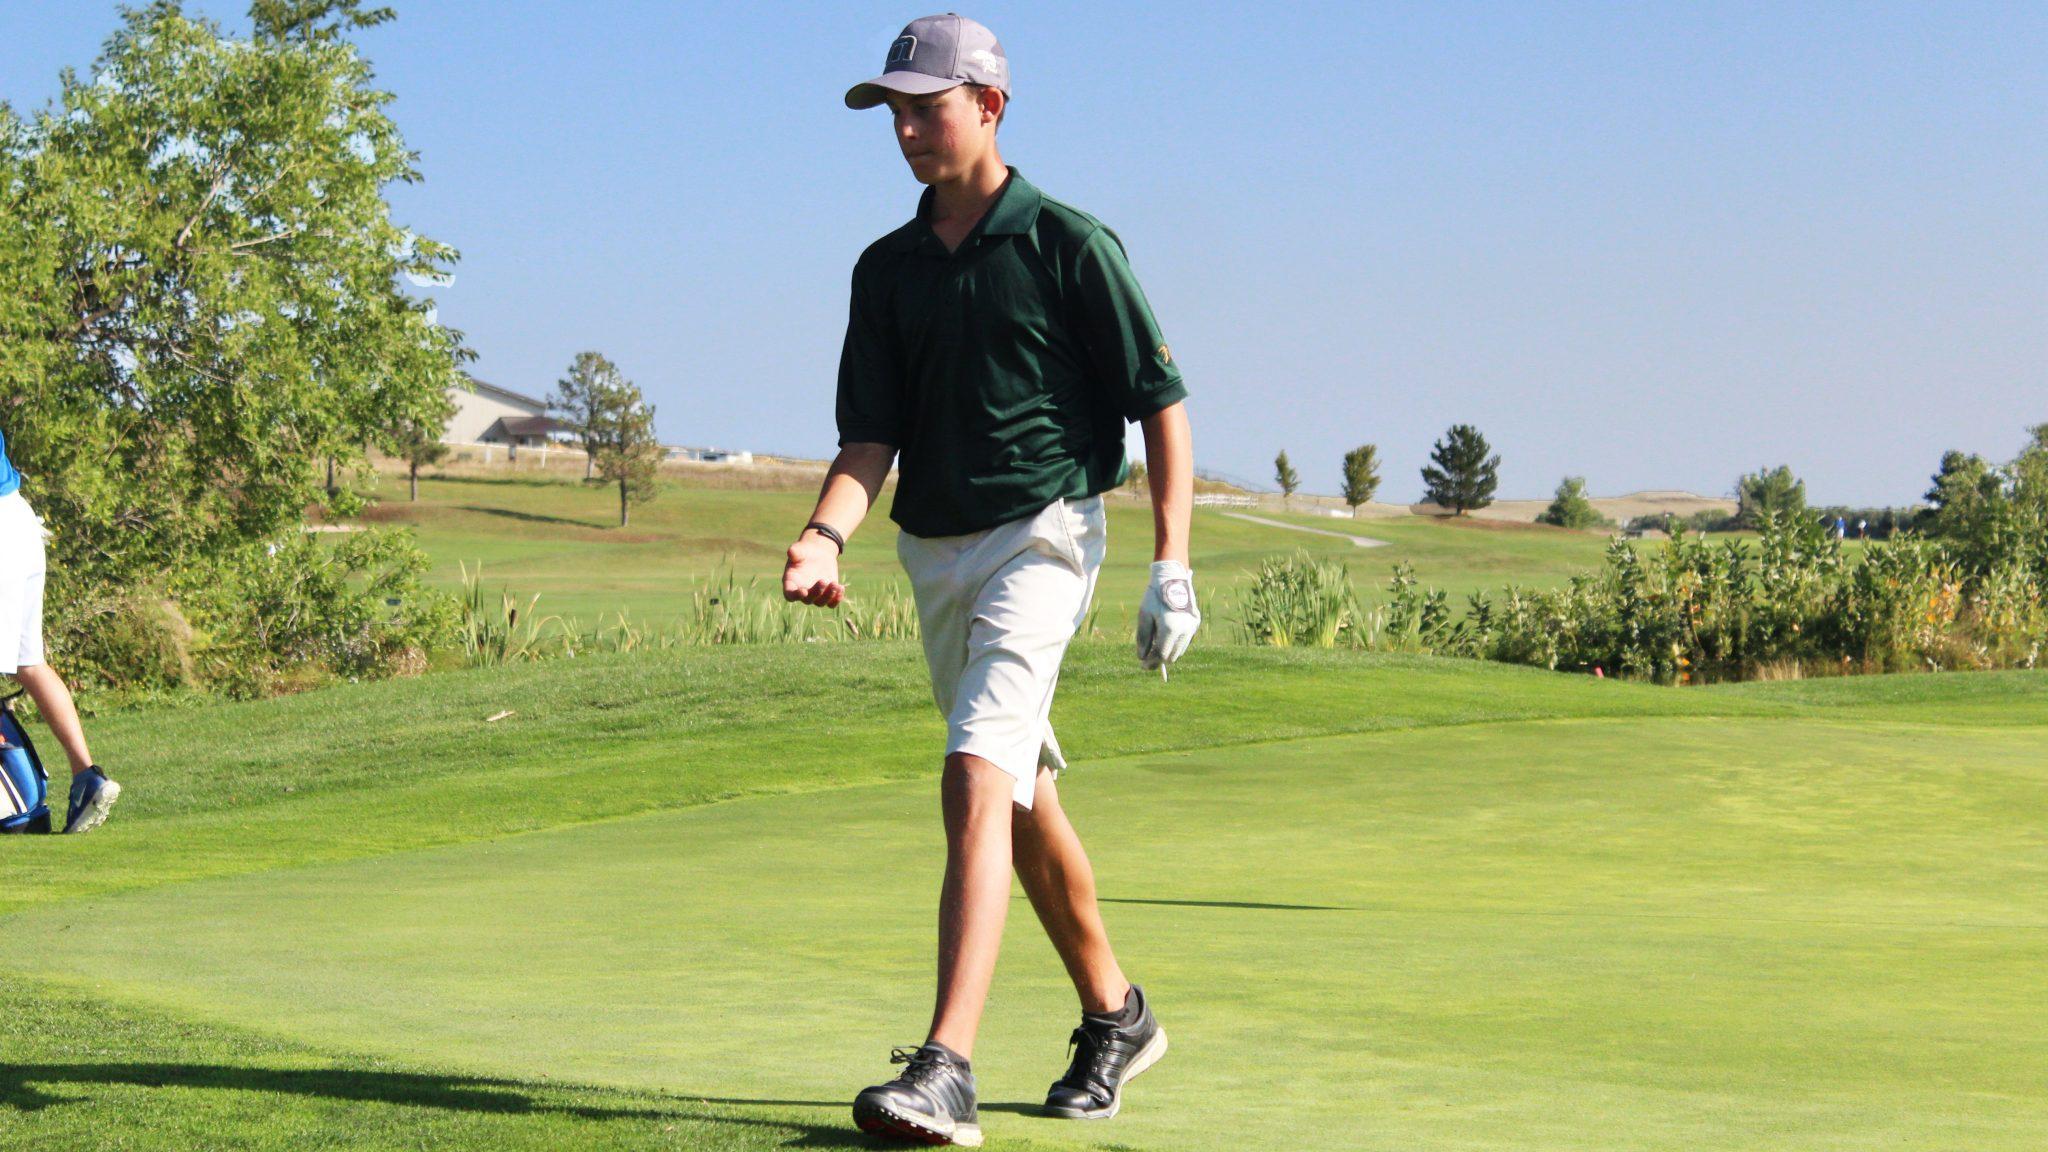 PHOTO GALLERY: Men's Varsity Golf